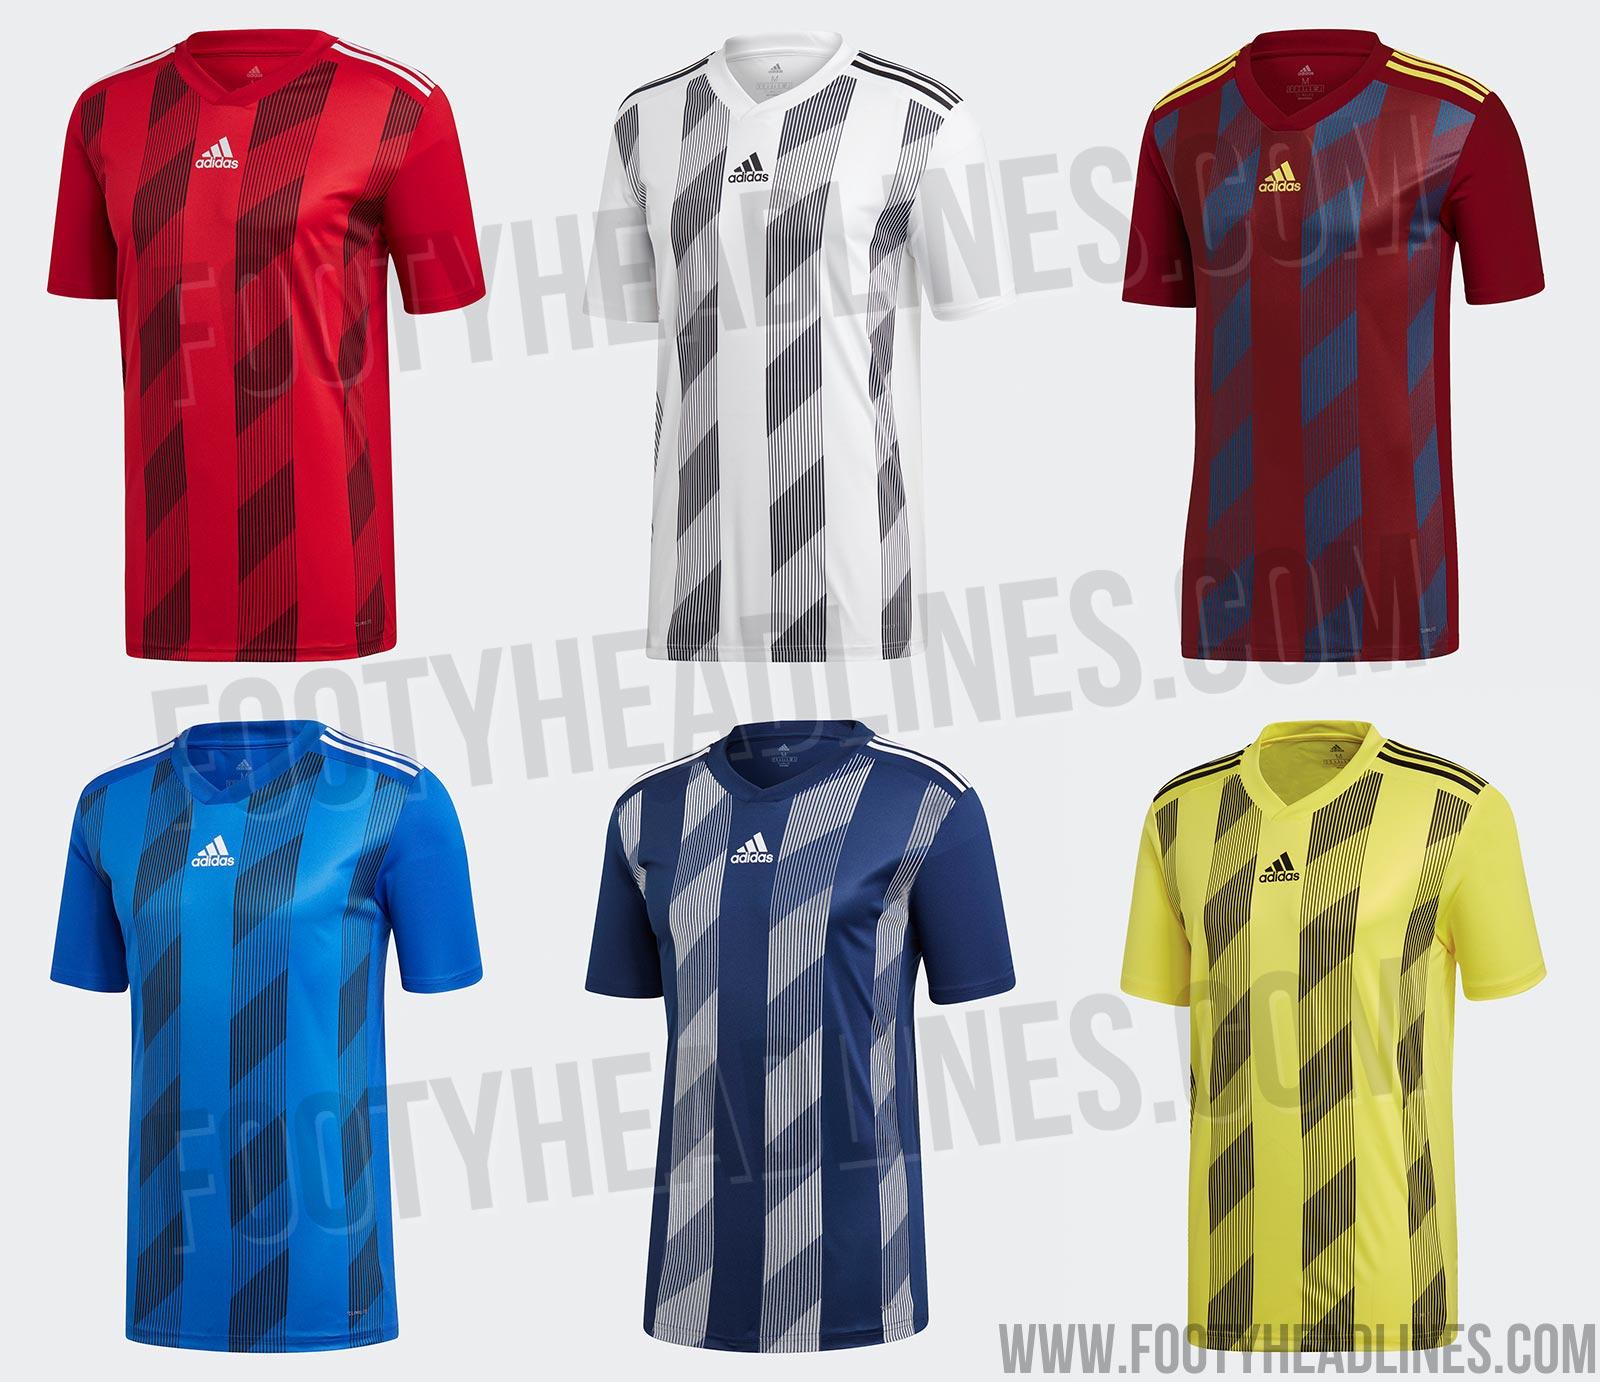 adidas-2019-20-teamwear-kits-1.jpg